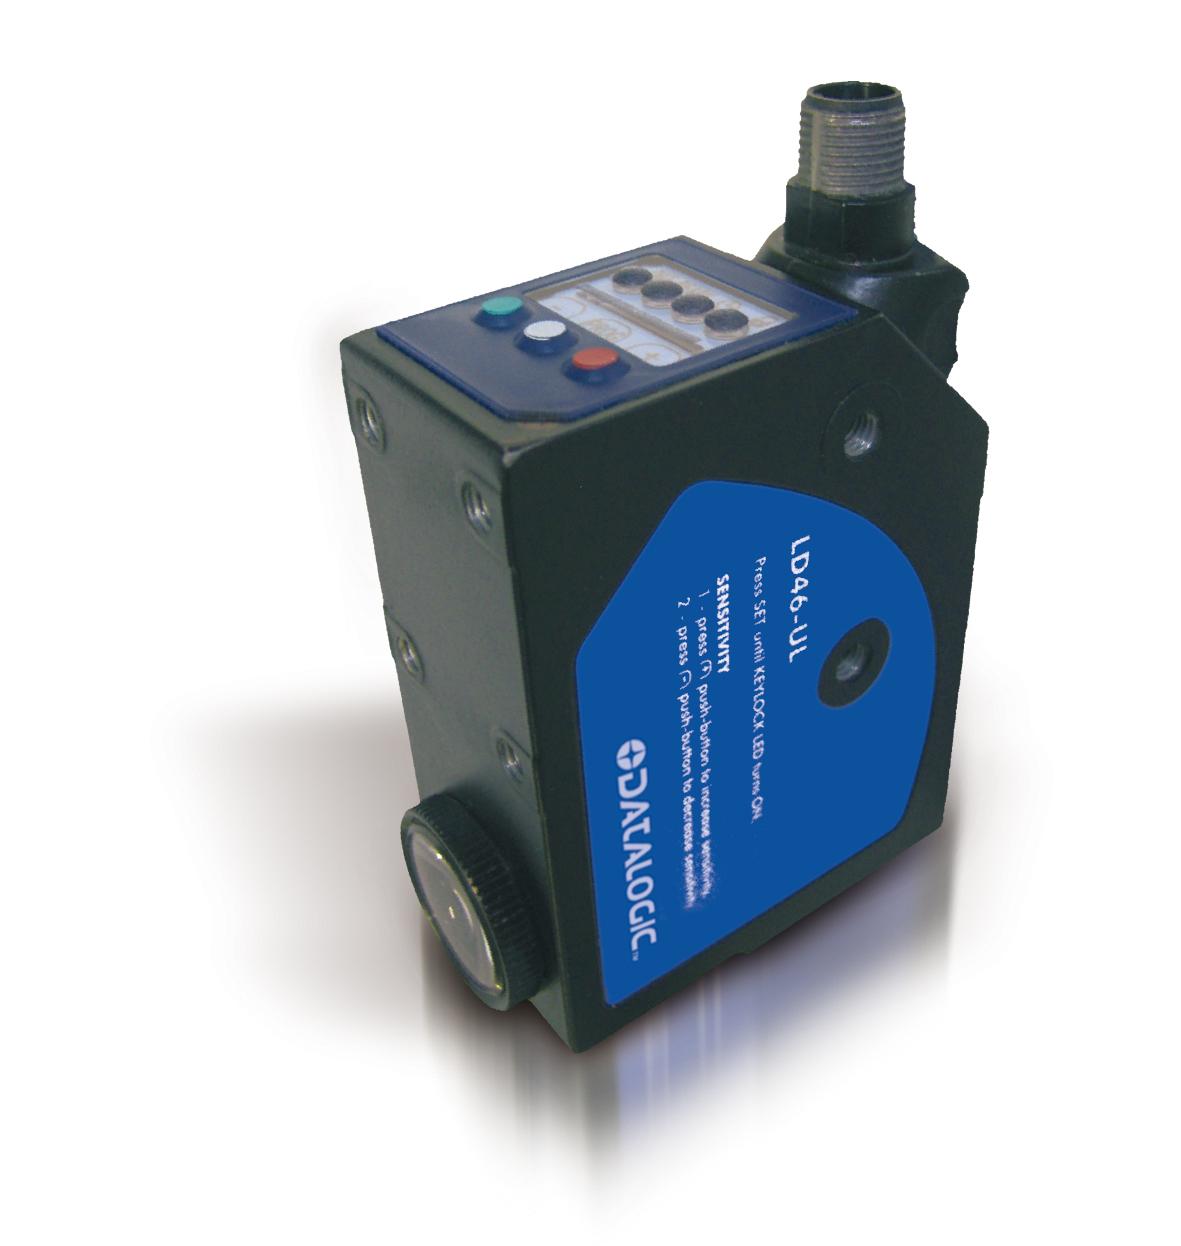 DATALOGIC LD46-UL-755, zasięg 20-40mm, PNP/NPN, konektor M12 – czujnik luminescencji